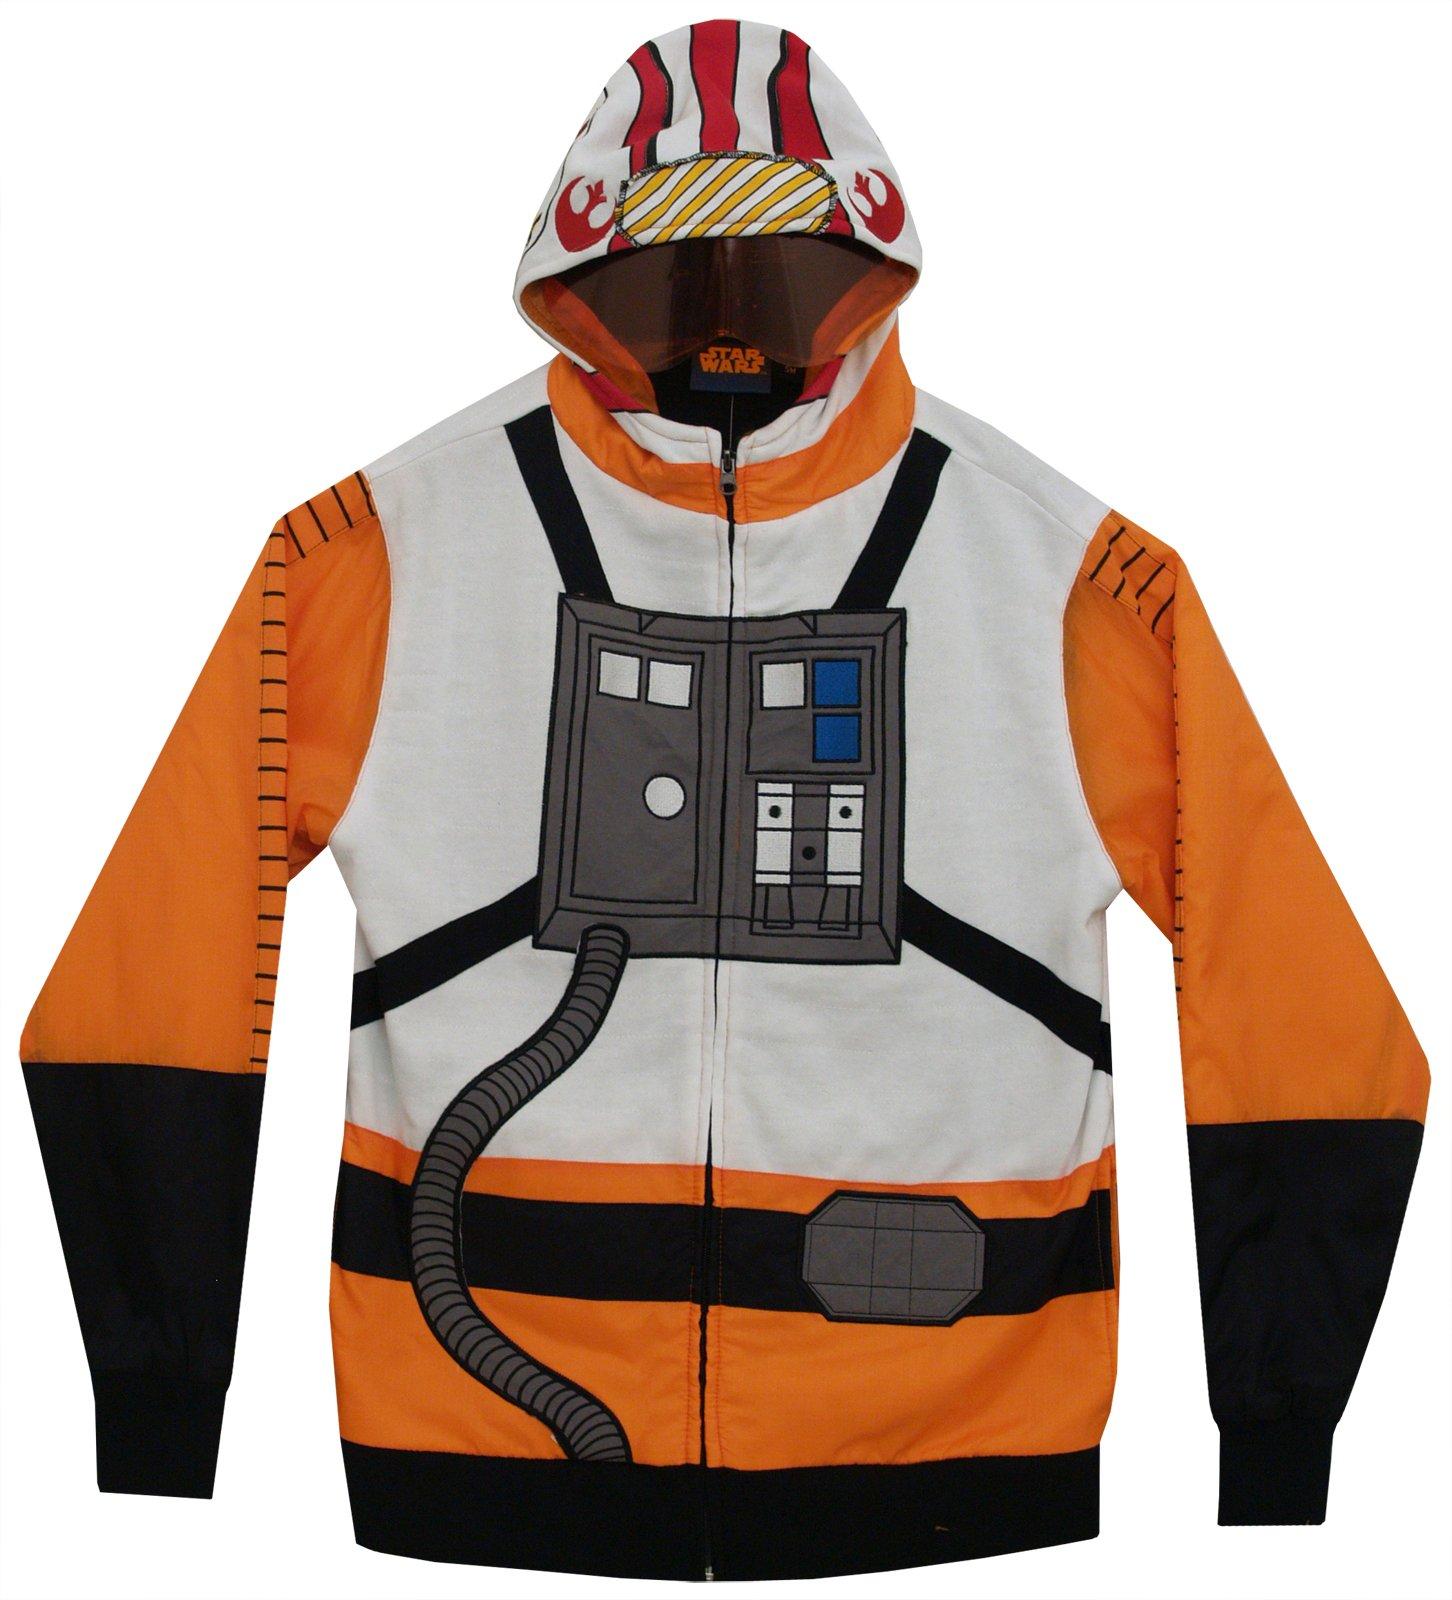 Star Wars I Am Red 5 Costume Zip Up Hoodie Sweatshirt